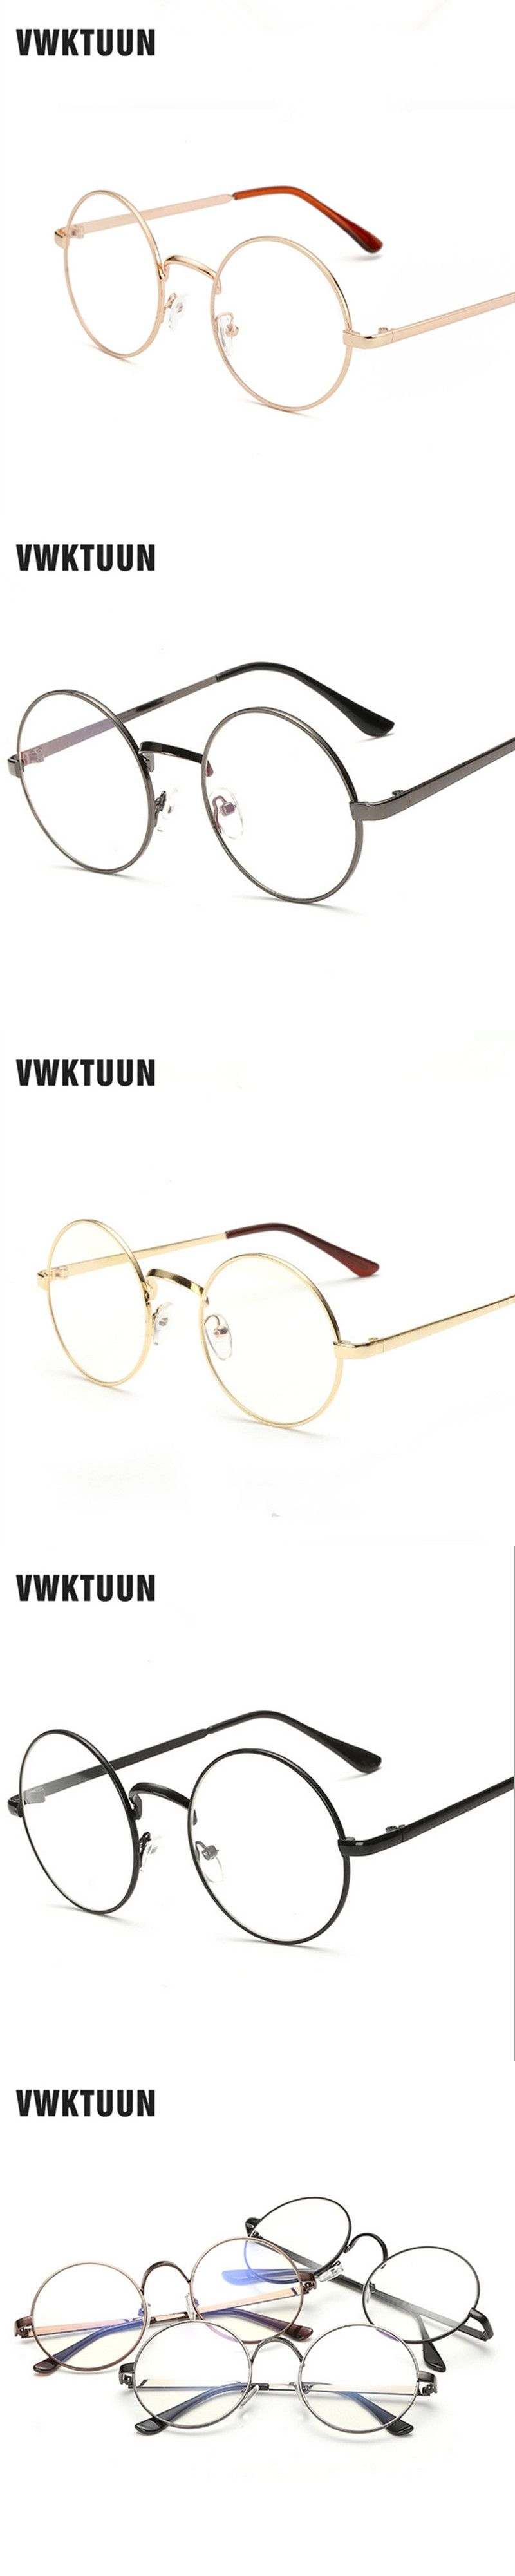 2dc339a04ff5 VWKTUUN Round Glasses Frame Women Men Eyeglasses Frames Plain Eyeglass  Spectacle Vintage Students Glasses Frame Fake